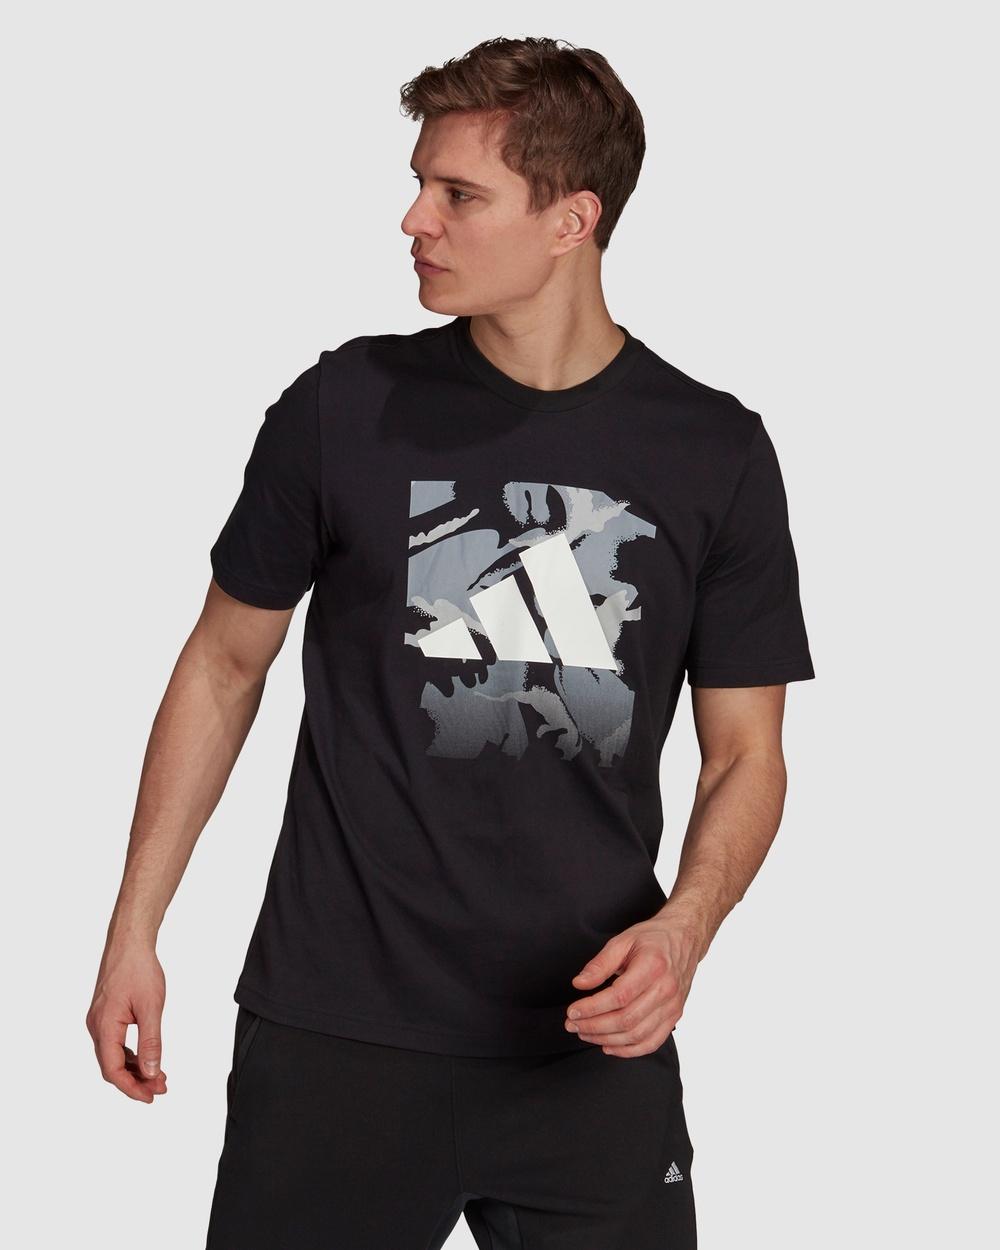 adidas Performance Graphic Tee T-Shirts & Singlets Black